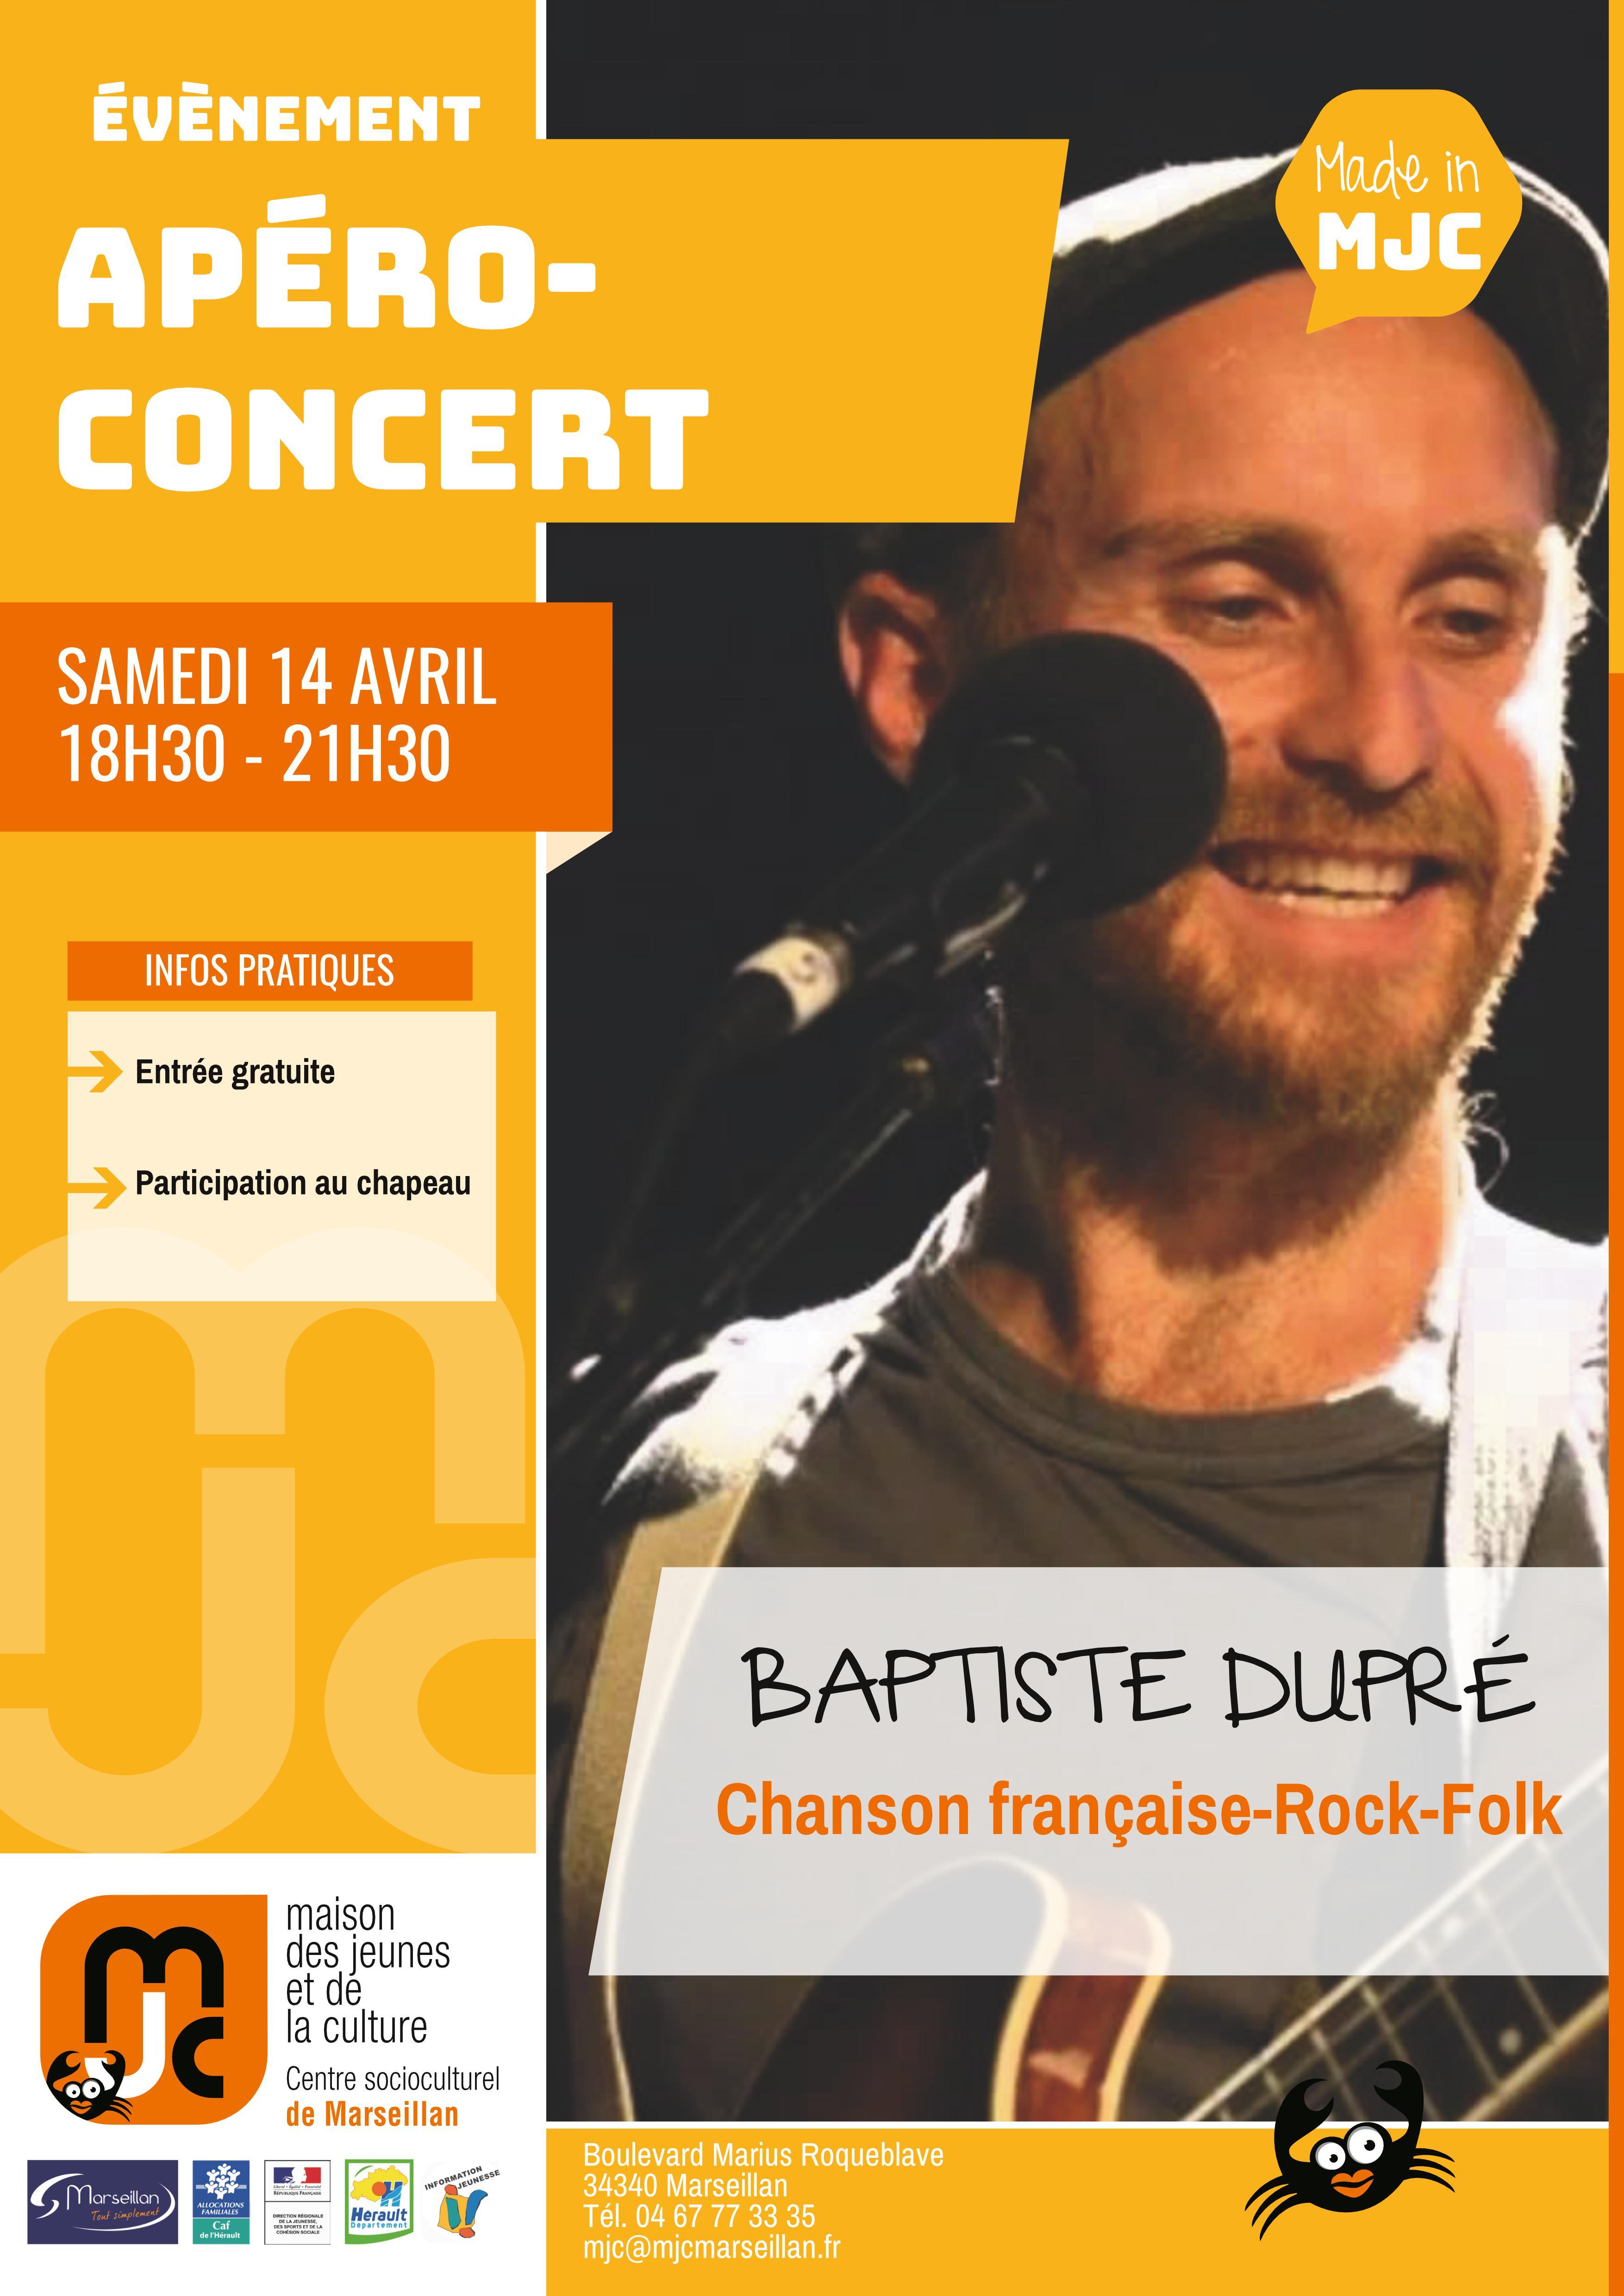 Samedi 14 avril 2018 : Apéro-concert : Baptiste Dupré